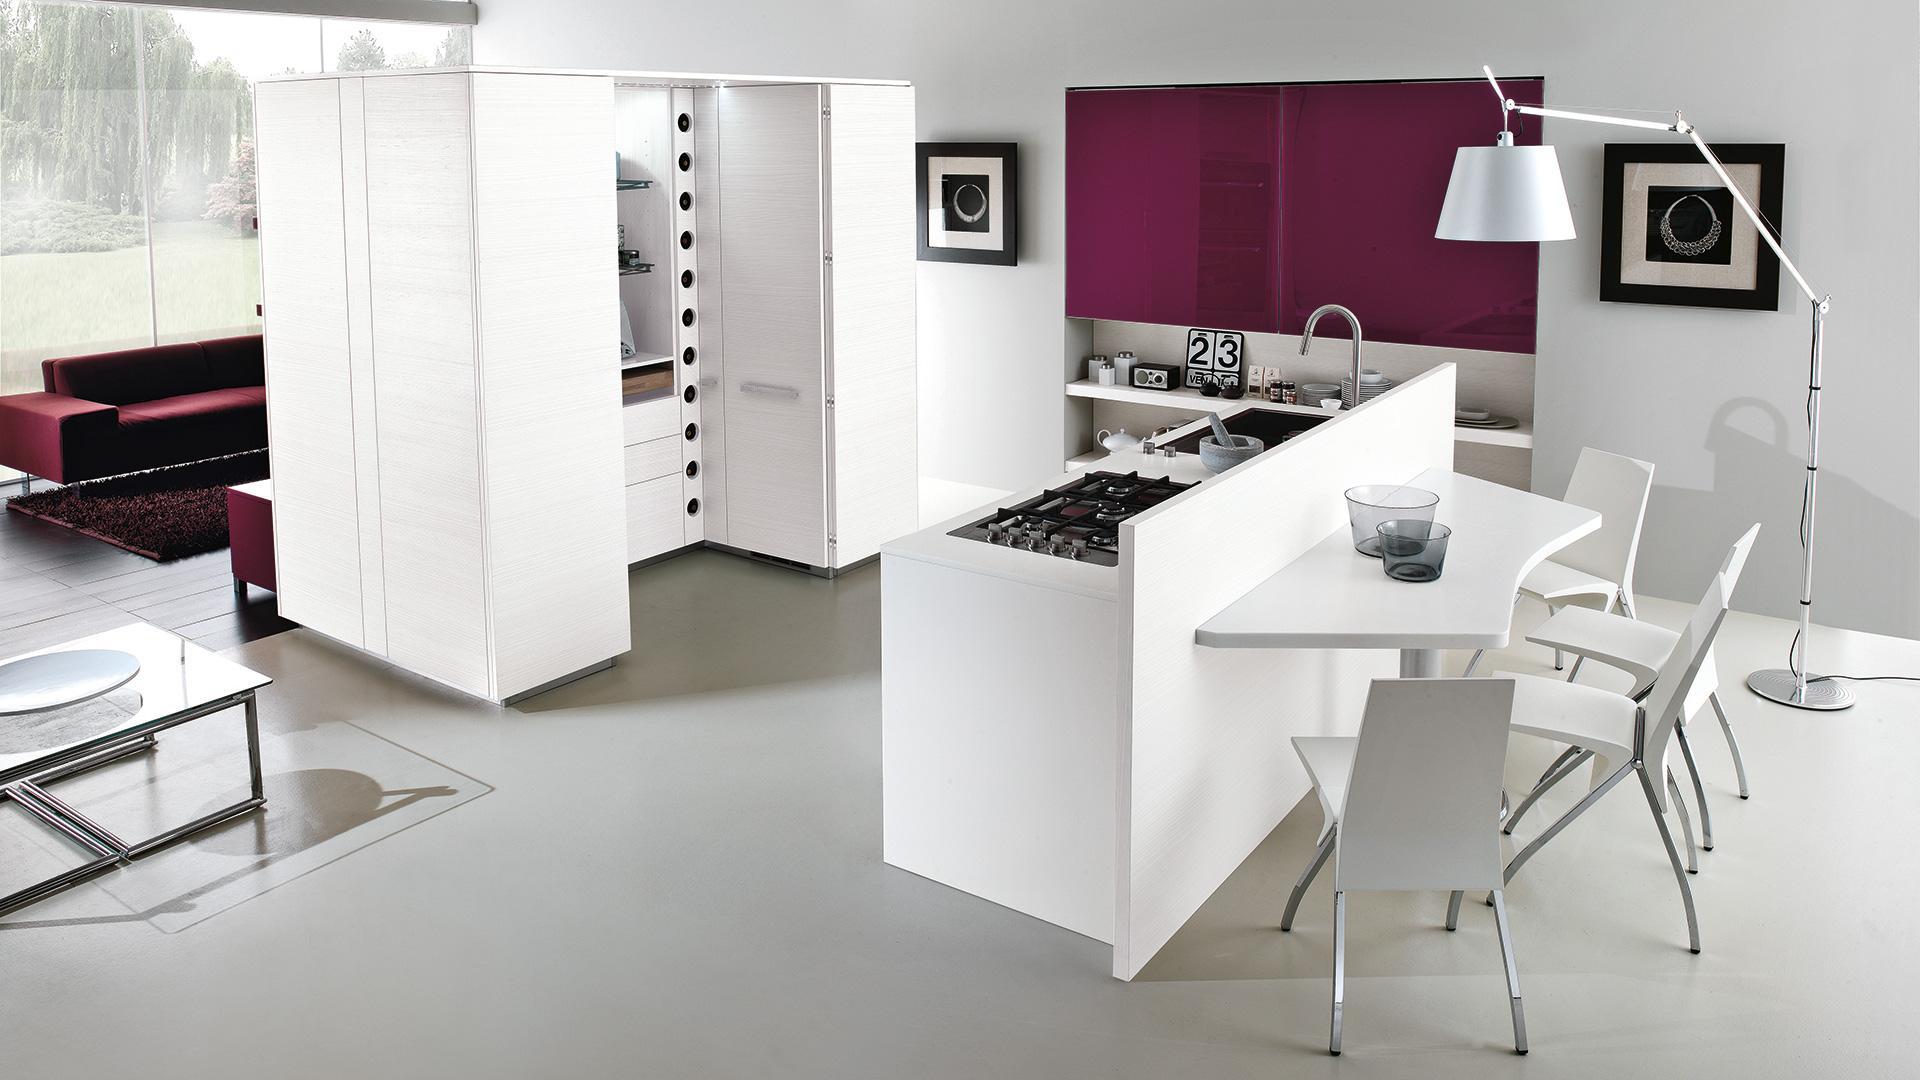 Cucine moderne con isola centrale good cucine moderne con - Cucine con isola centrale ...